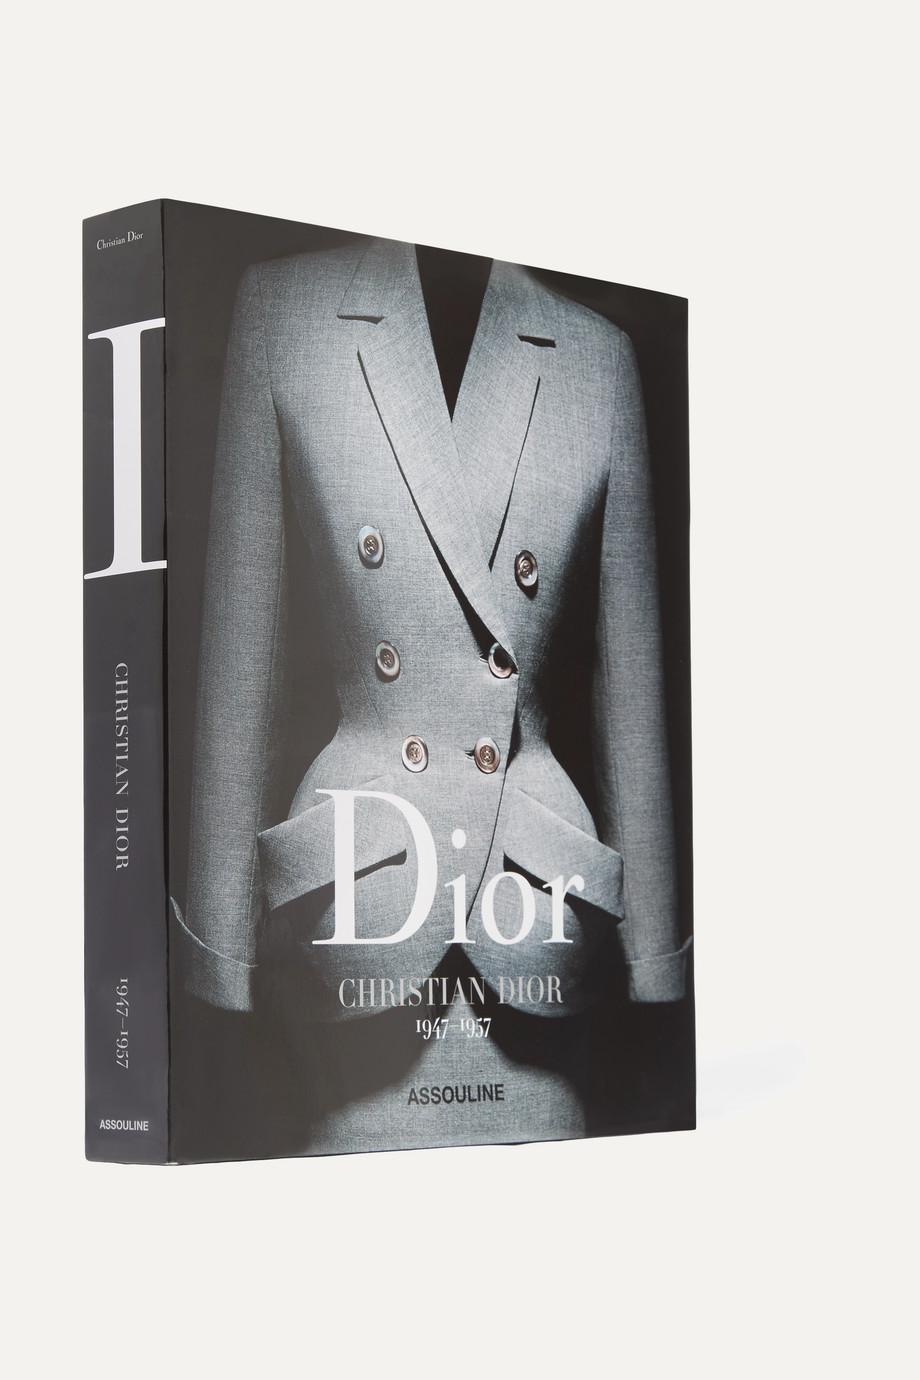 Assouline Dior: Christian Dior 1947-1957 by Olivier Saillard hardcover book